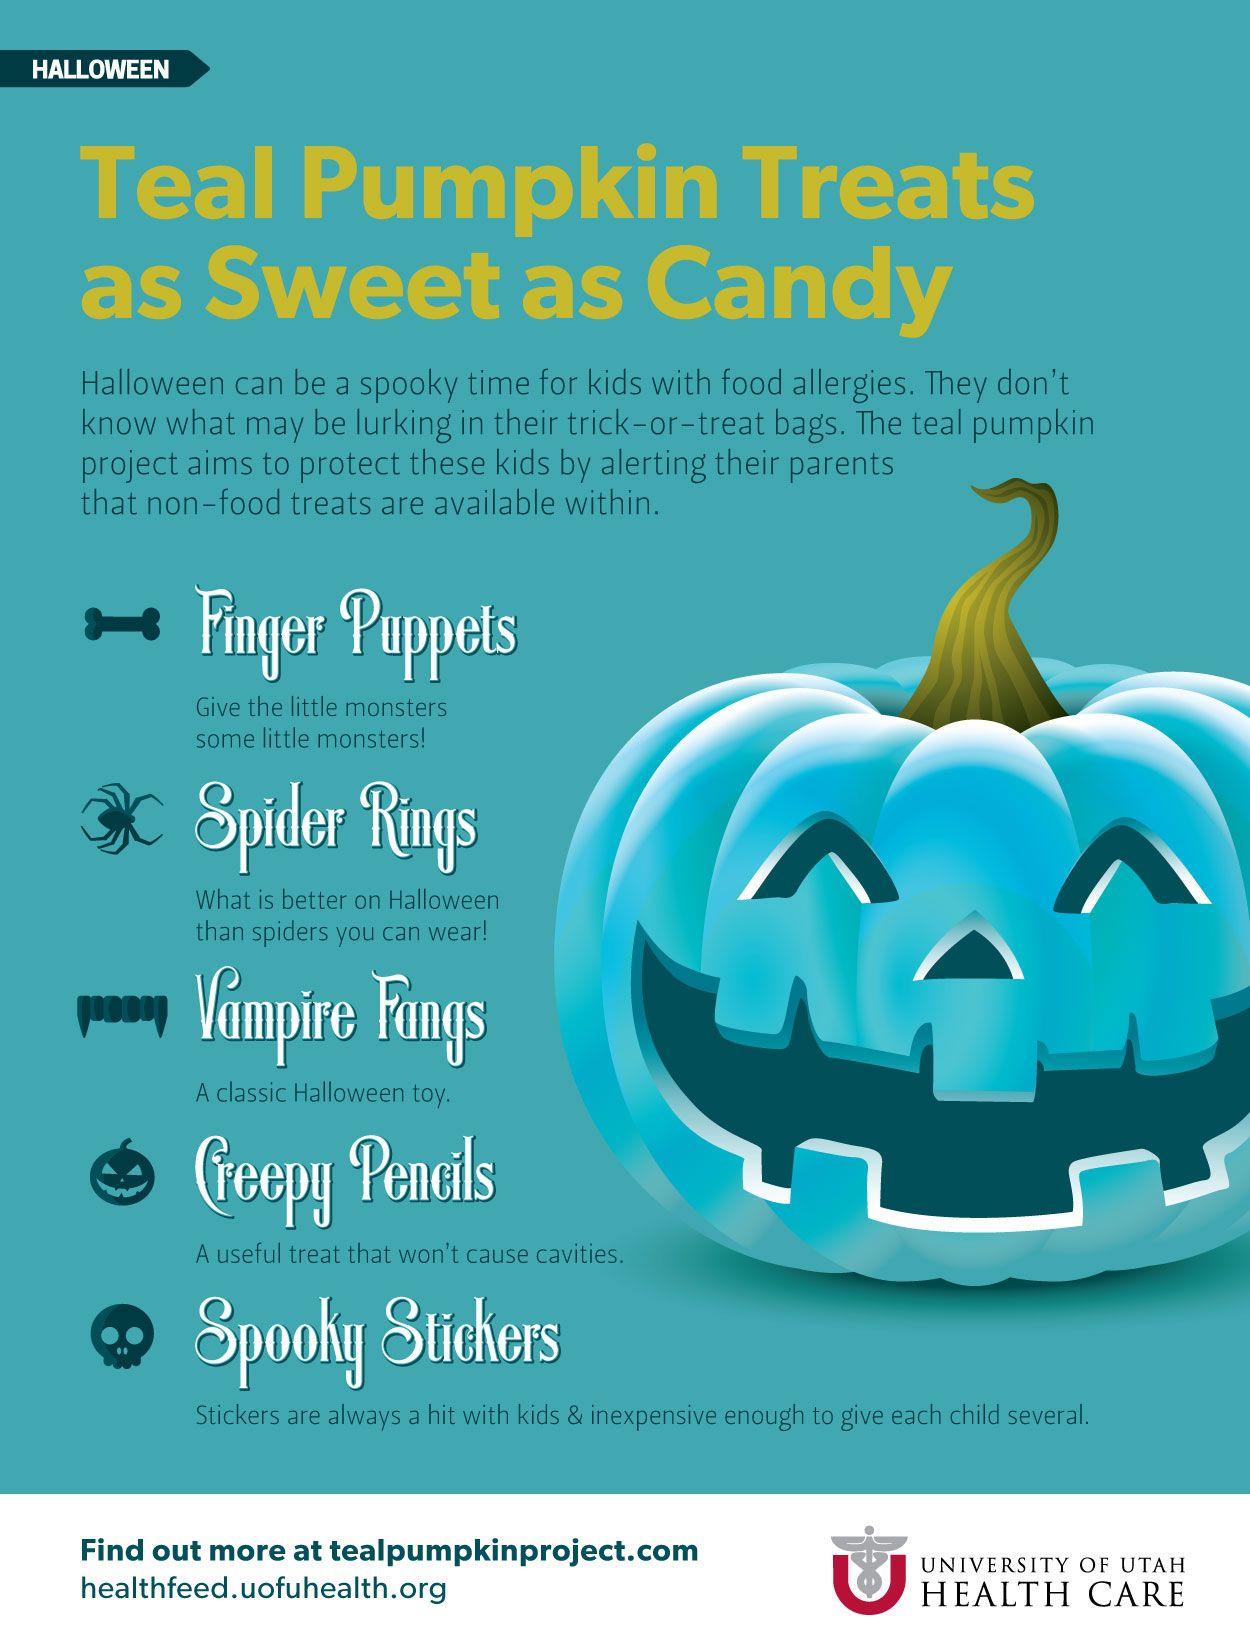 Teal for Treats foodallergies kids halloween trickortreat